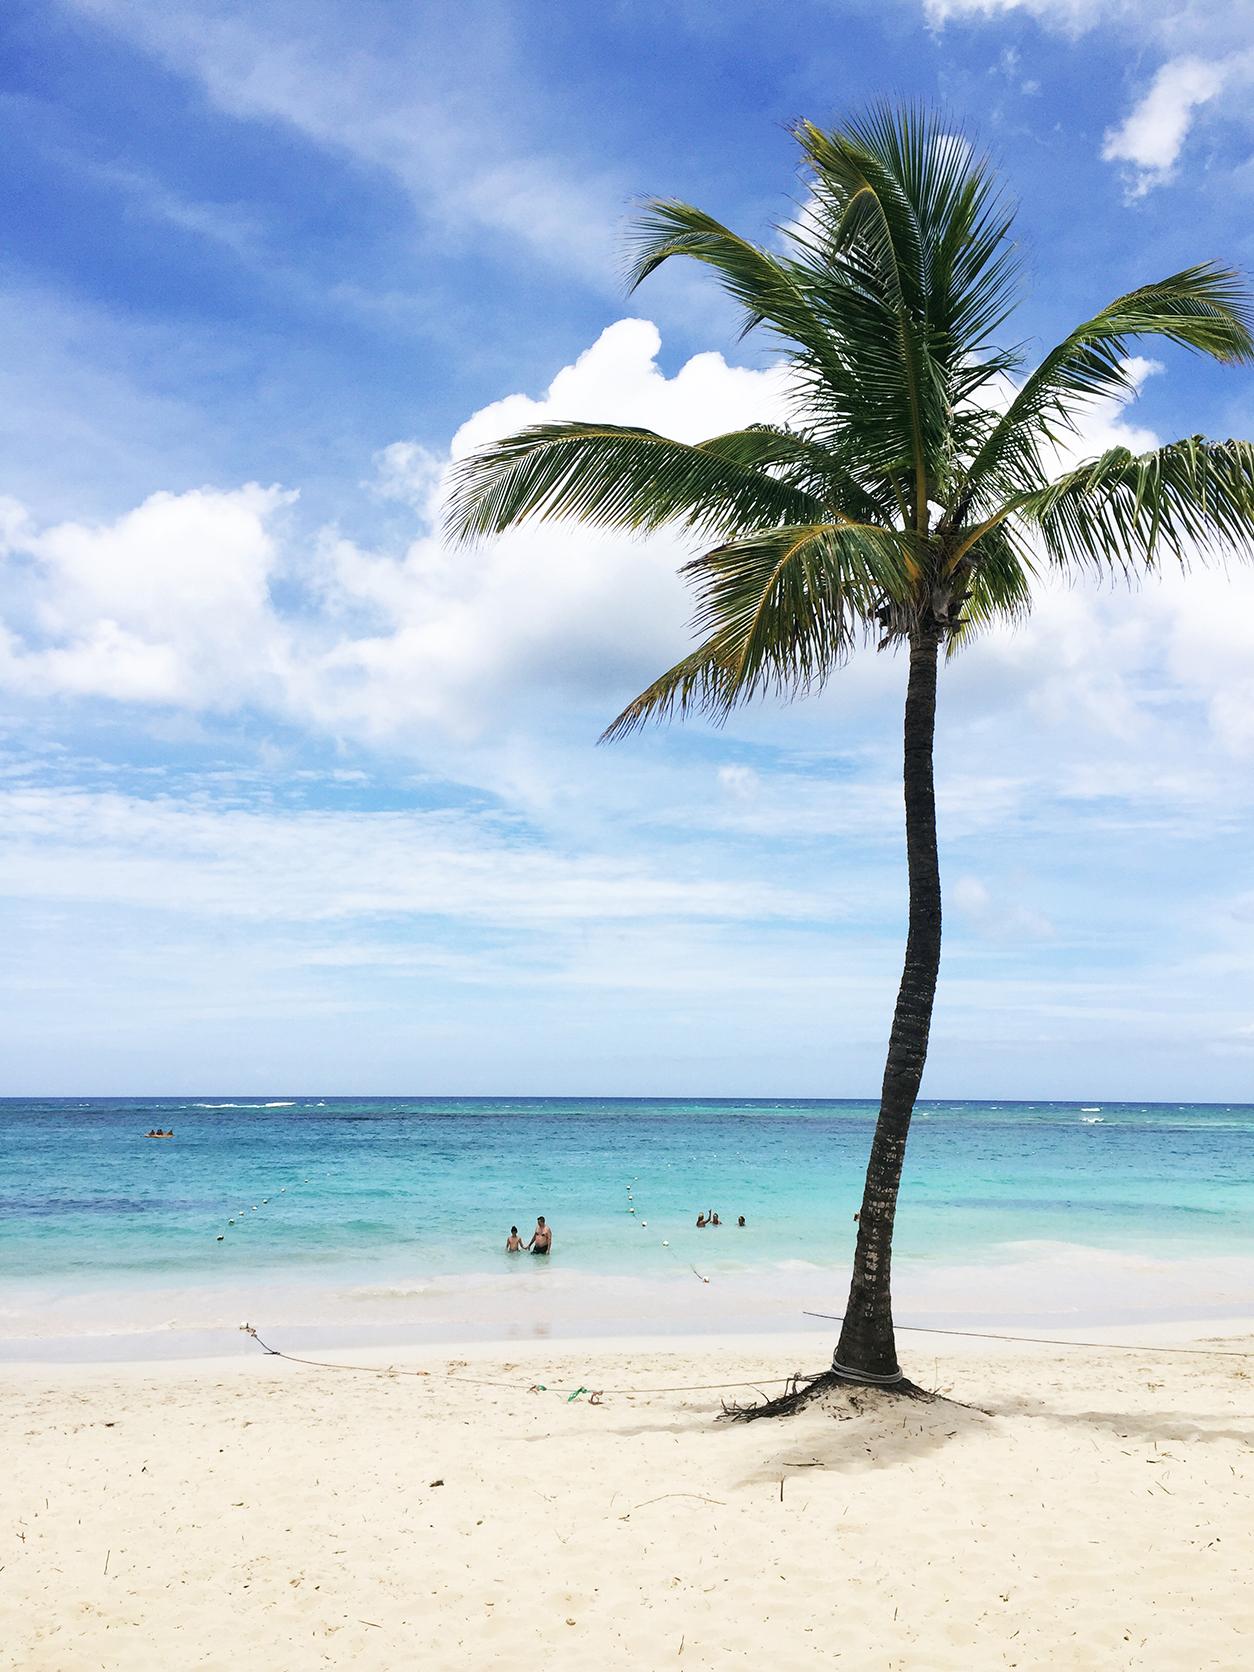 Sunday Splash_Dominican Republic, Puppy Love & the GIVEAWAY Winner_Palm tree in Punta Cana, Dominican Republic_joyfetti.com